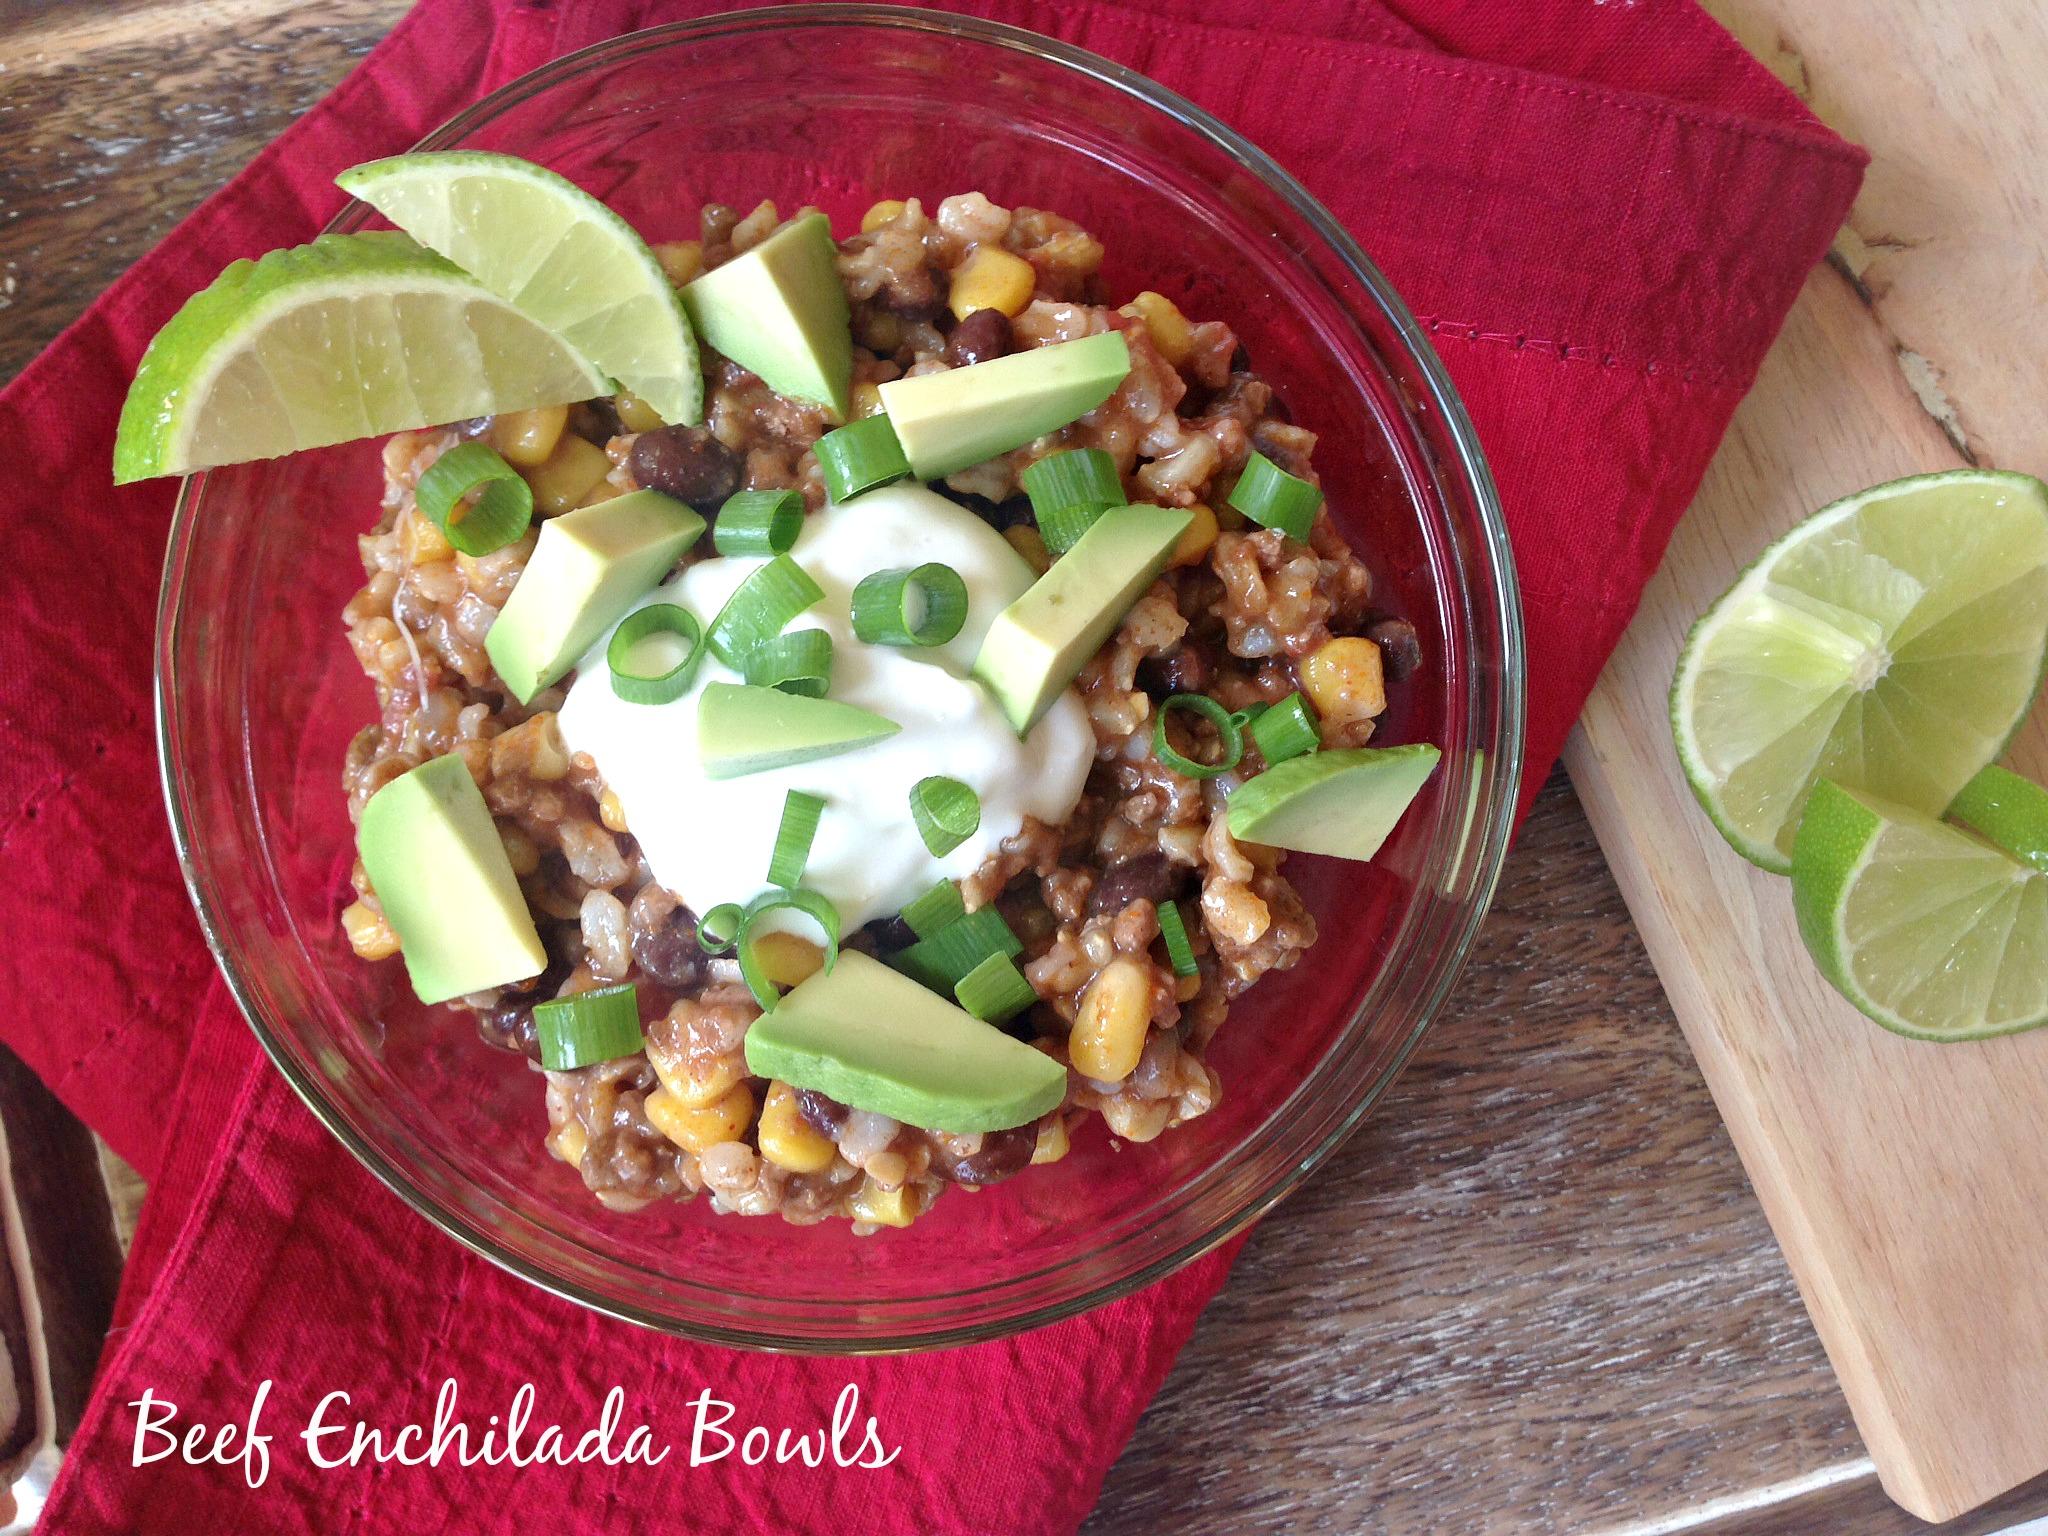 Low-Fat Beef Enchilada Bowls